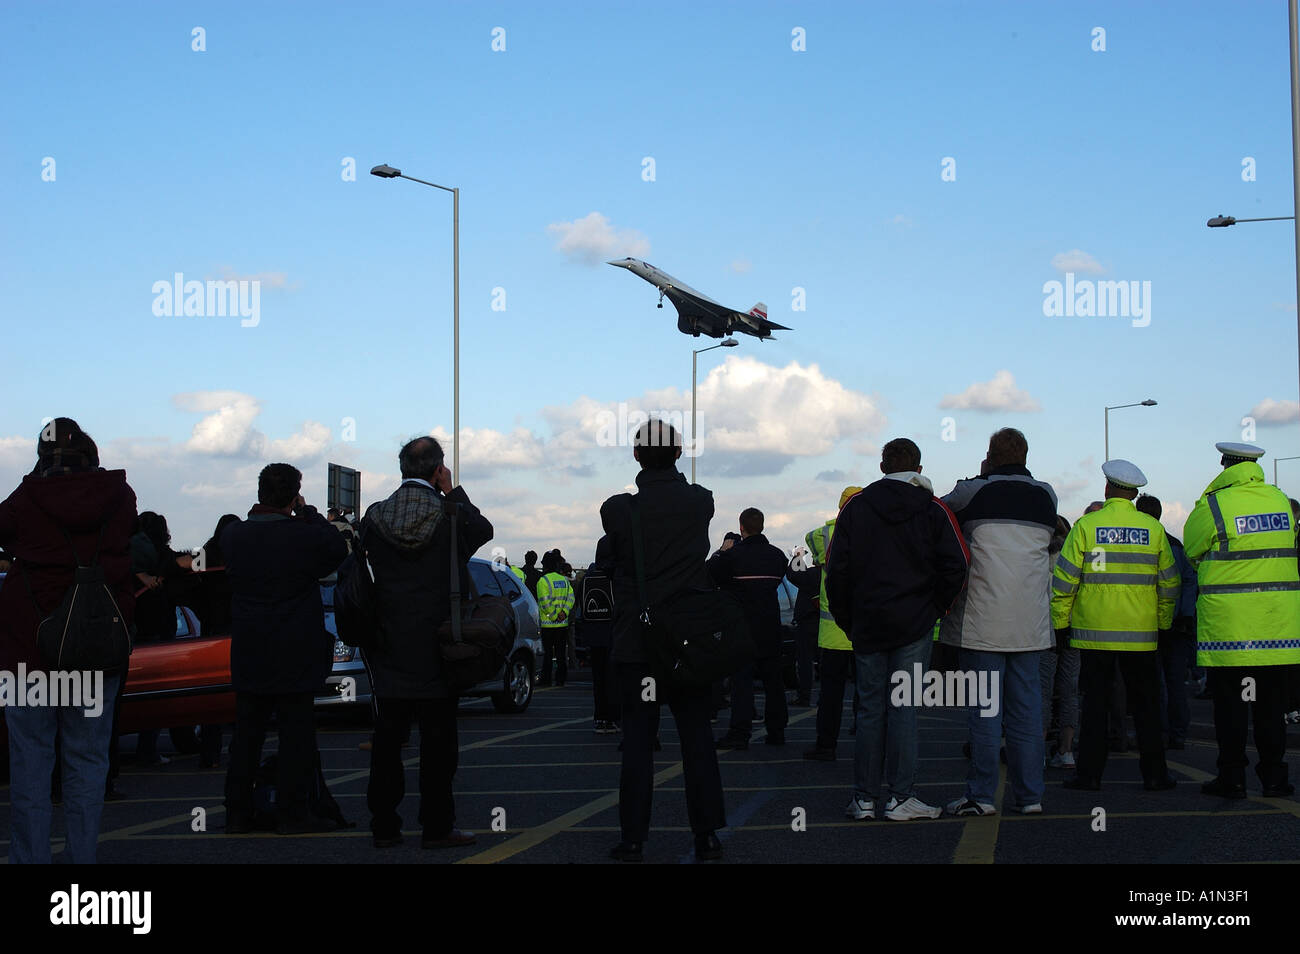 Concorde letzten kommerziellen Flug Ankunft am Flughafen Heathrow Stockbild